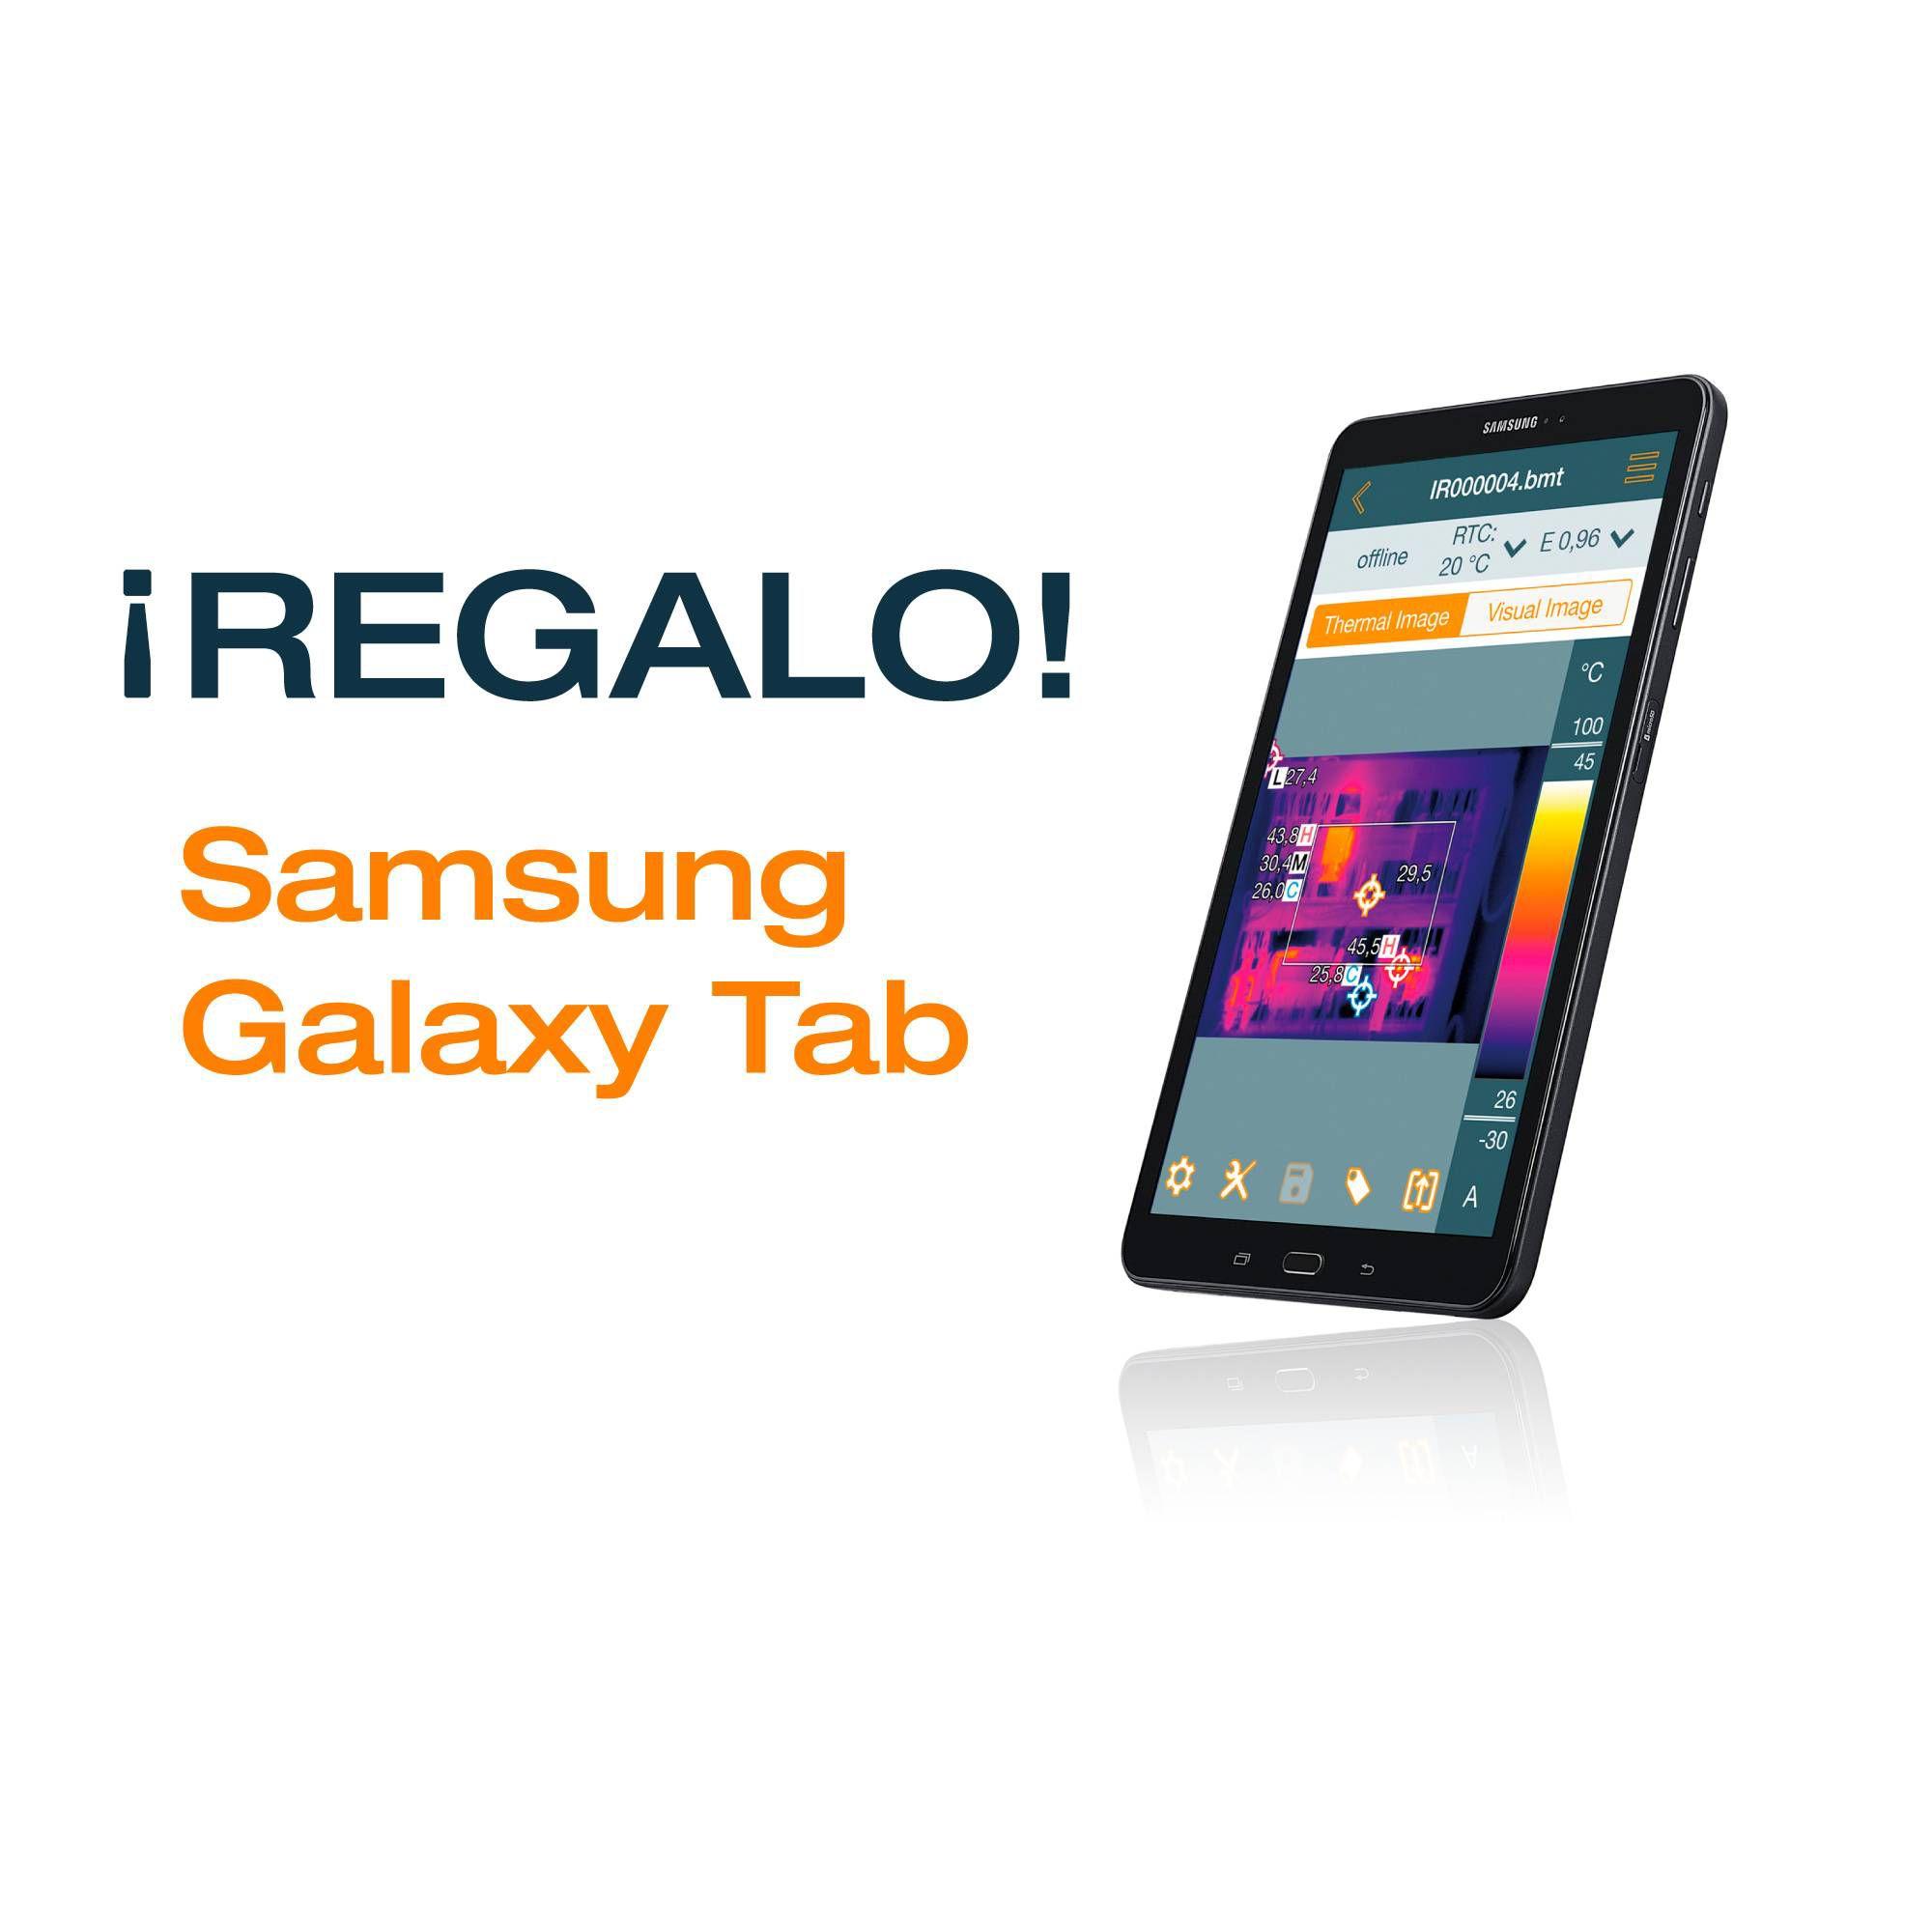 Imag-ES-TI-Promo-testo-865-872-tablet-2000x2000px.jpg